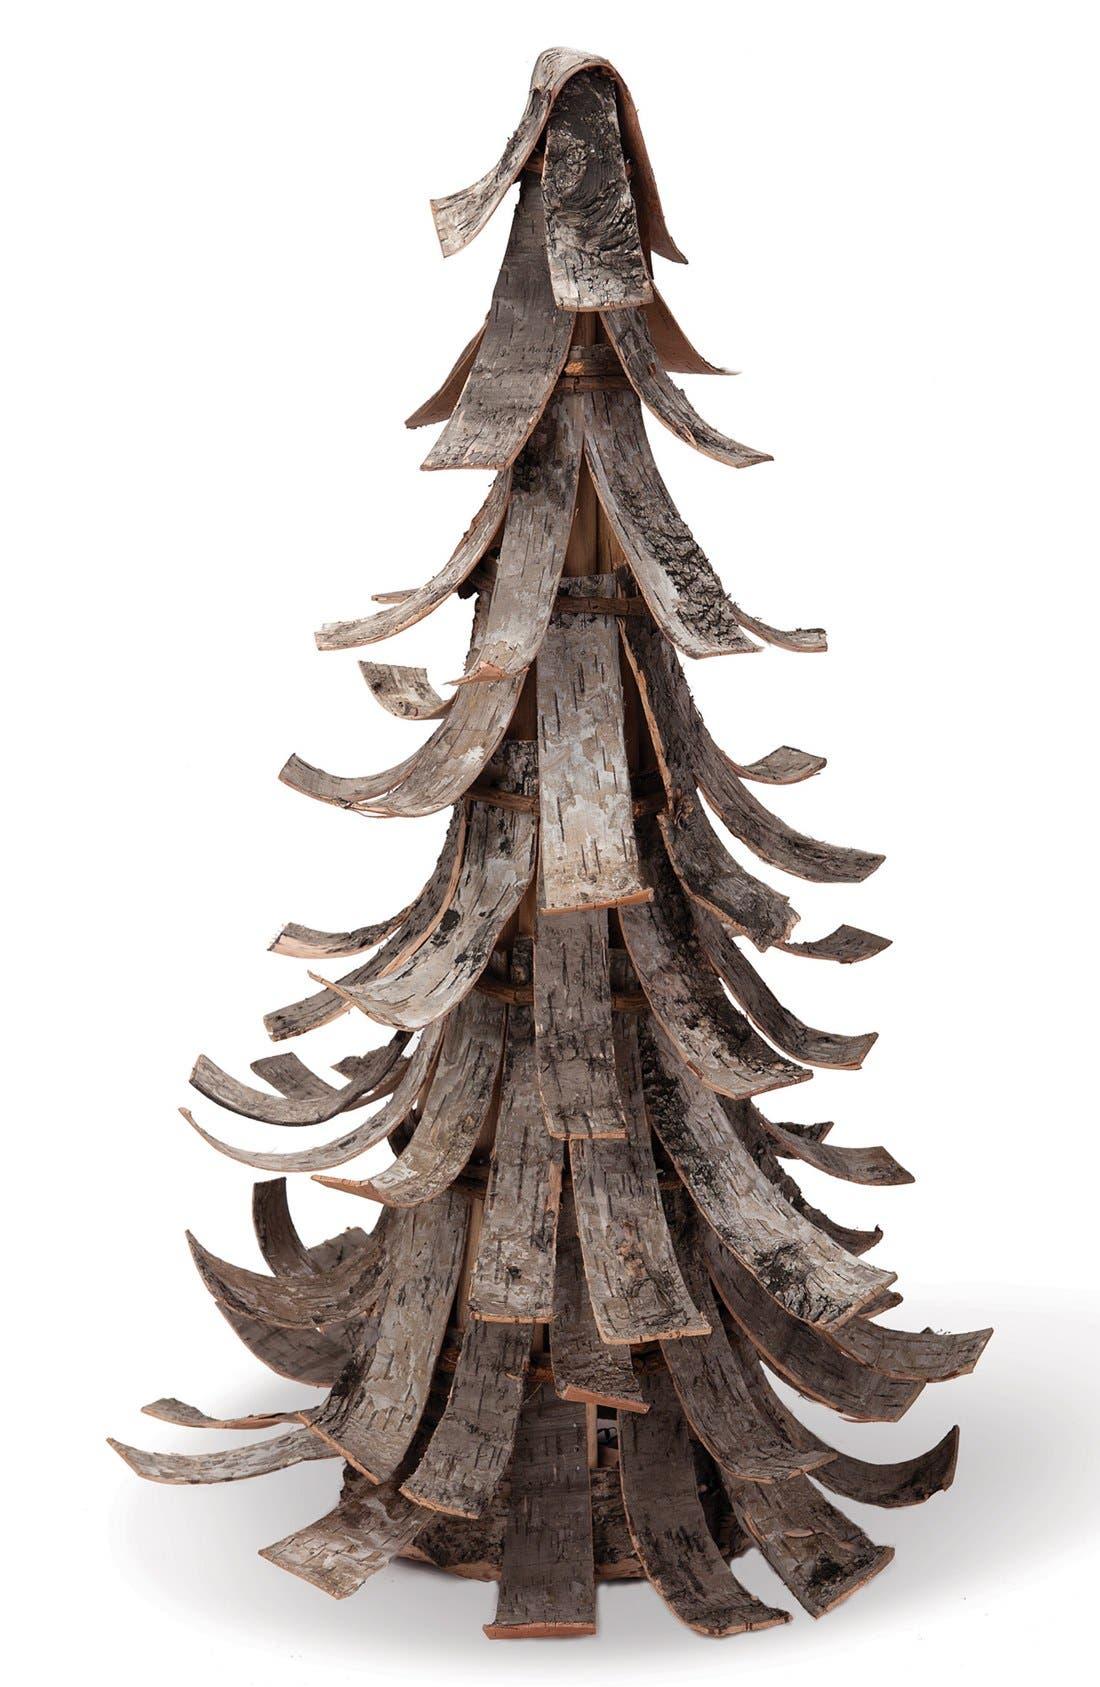 Alternate Image 1 Selected - Foreside Birch Bark Tree Decoration